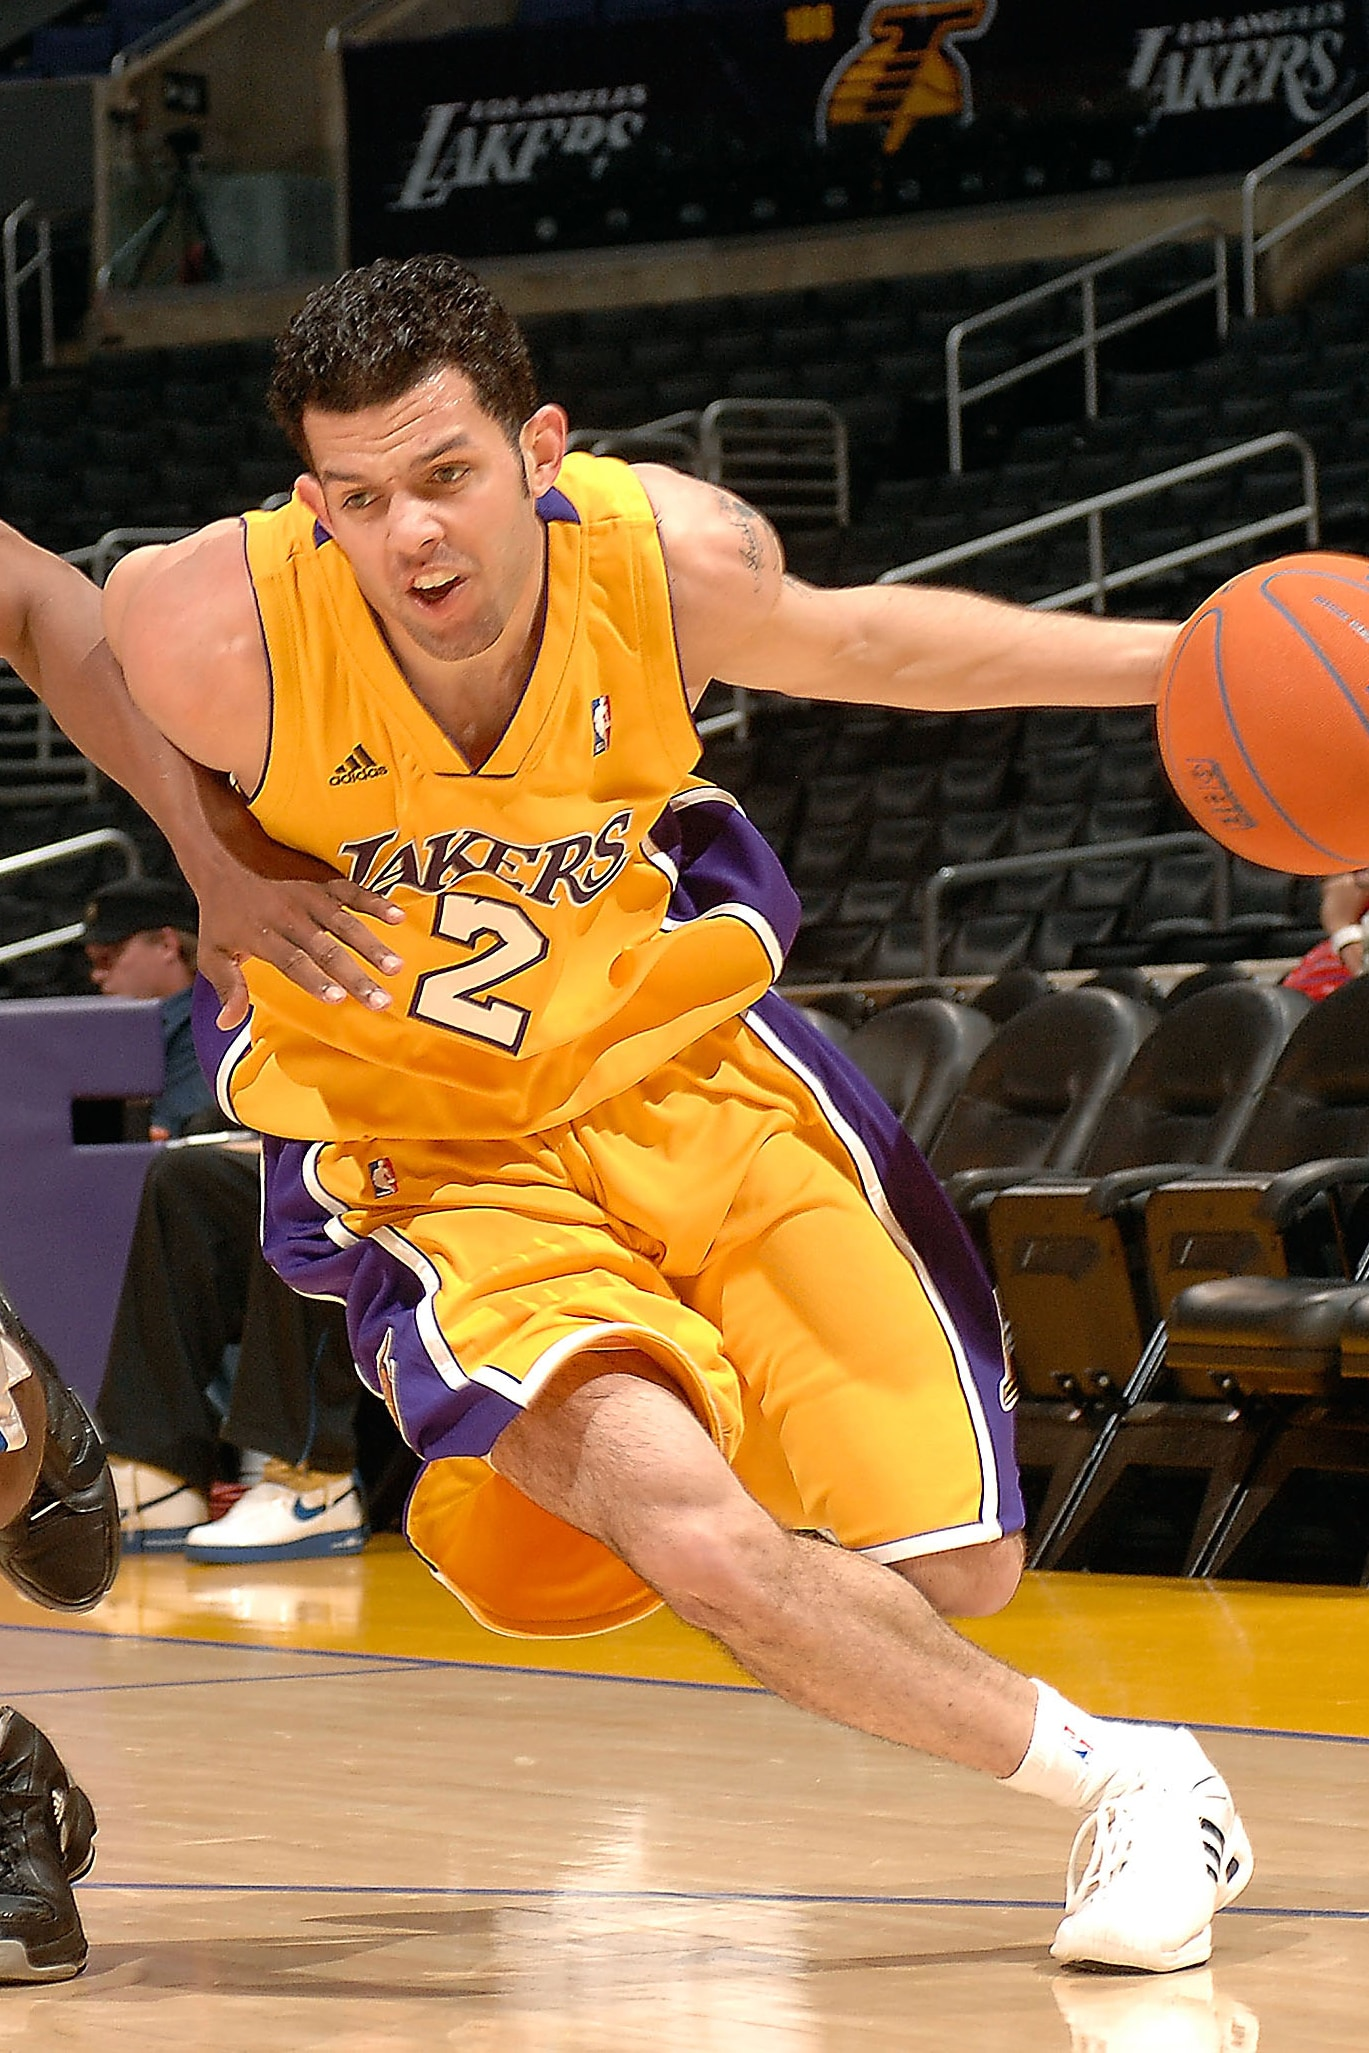 Jordan Farmar Player Picture